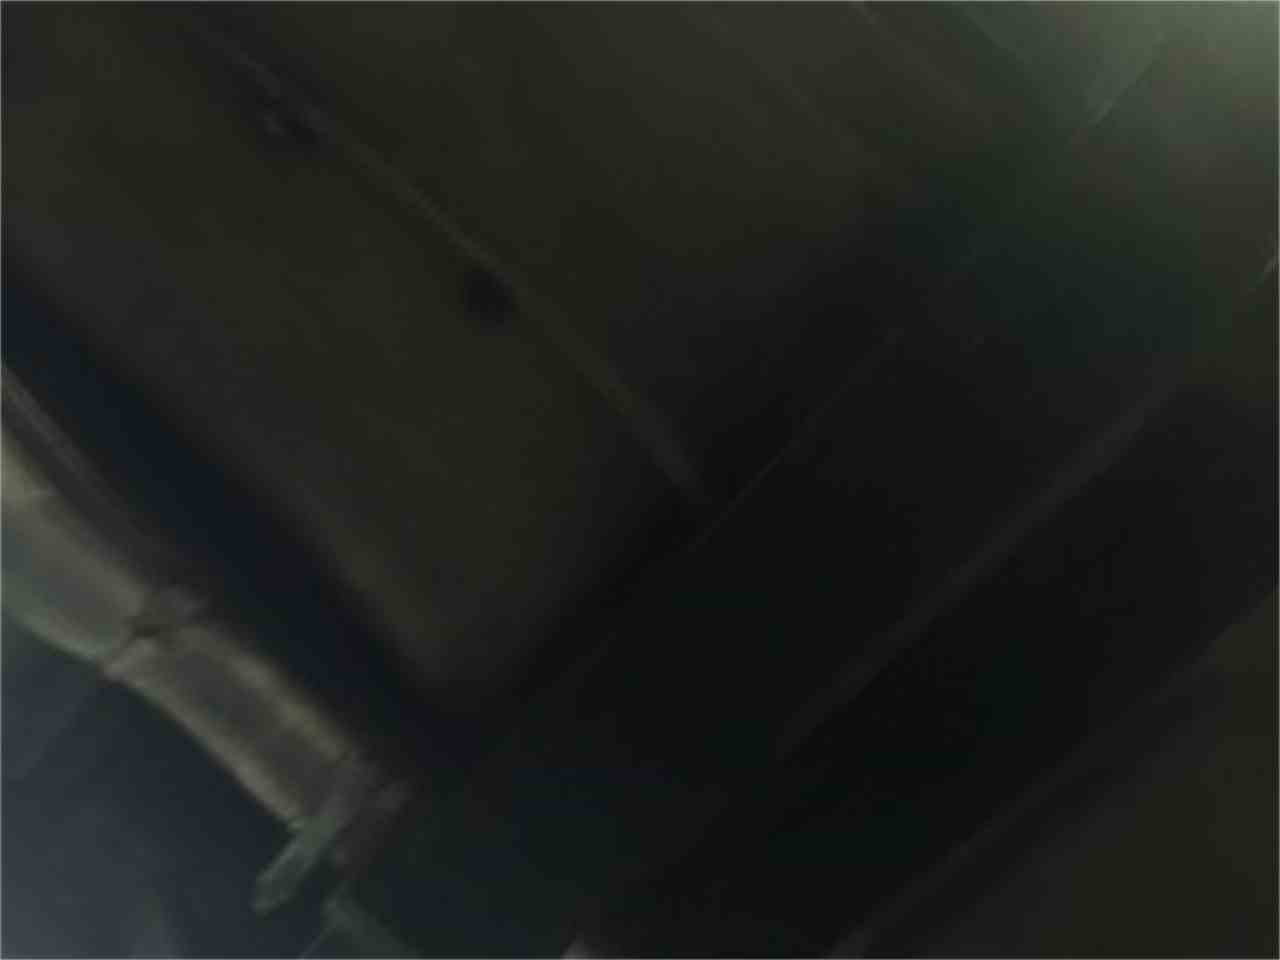 Large Picture of '65 Chevrolet Corvette located in Illinois - LTLA